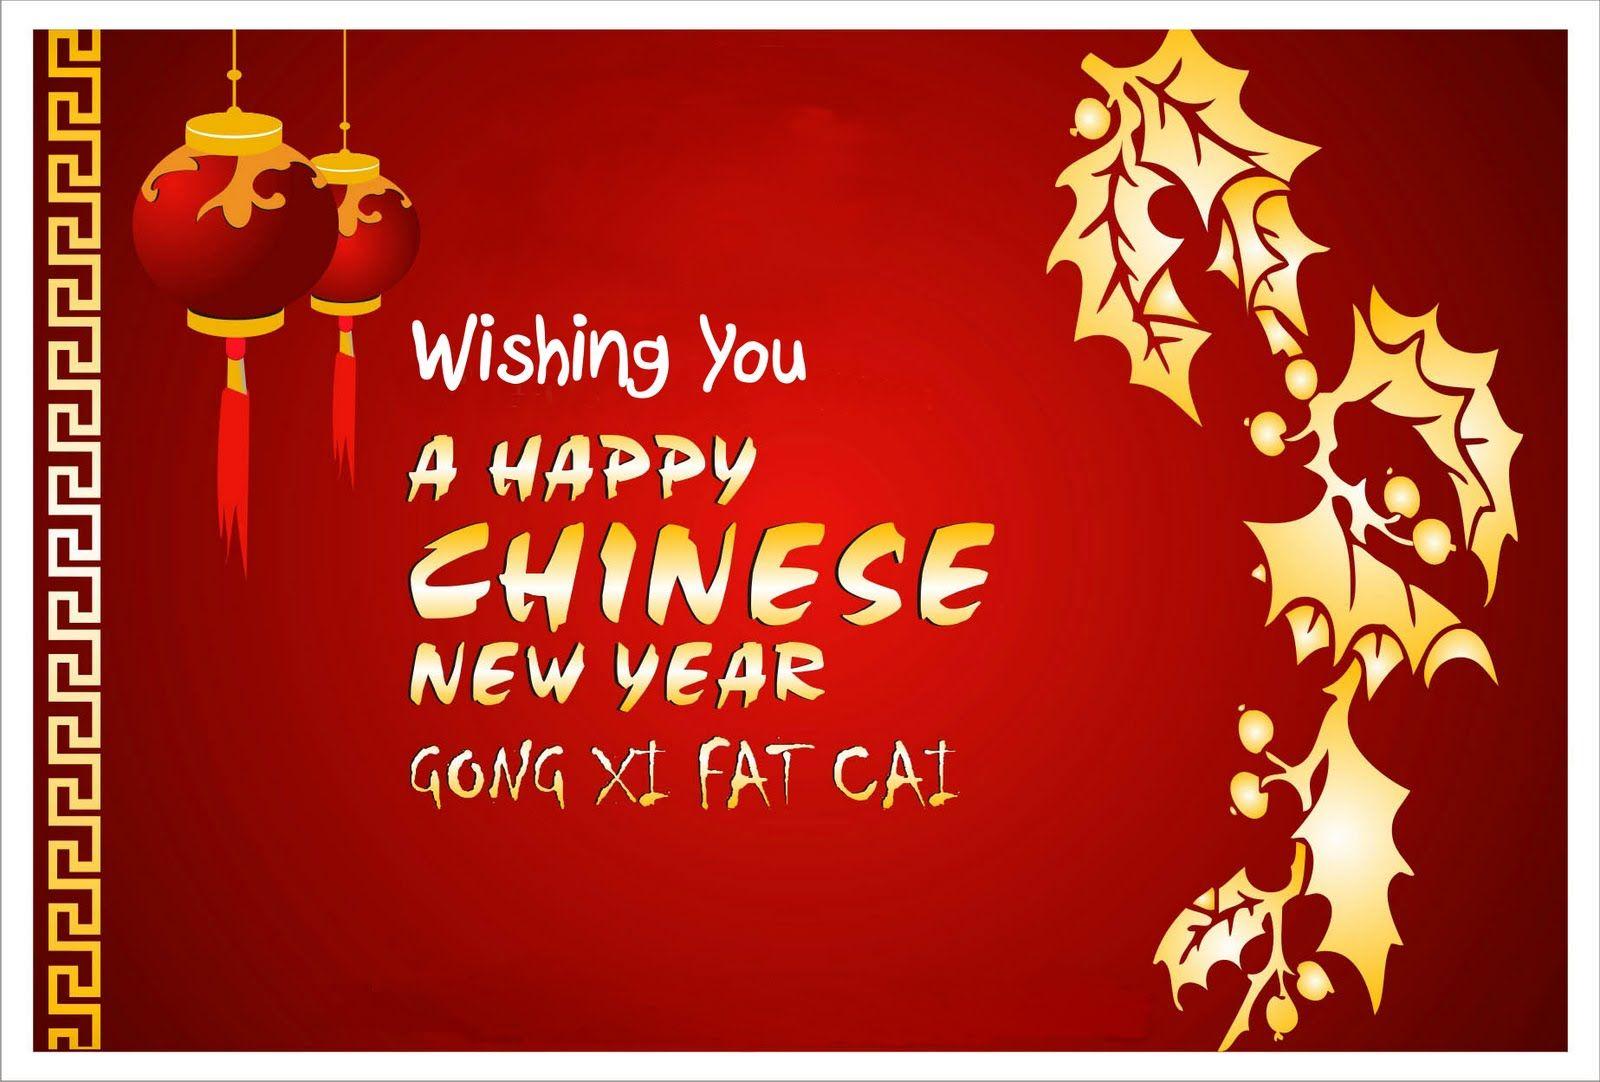 Forsa mengucapkan selamat tahun baru imlek gong xi fa cai explore new year greeting cards and more kristyandbryce Images